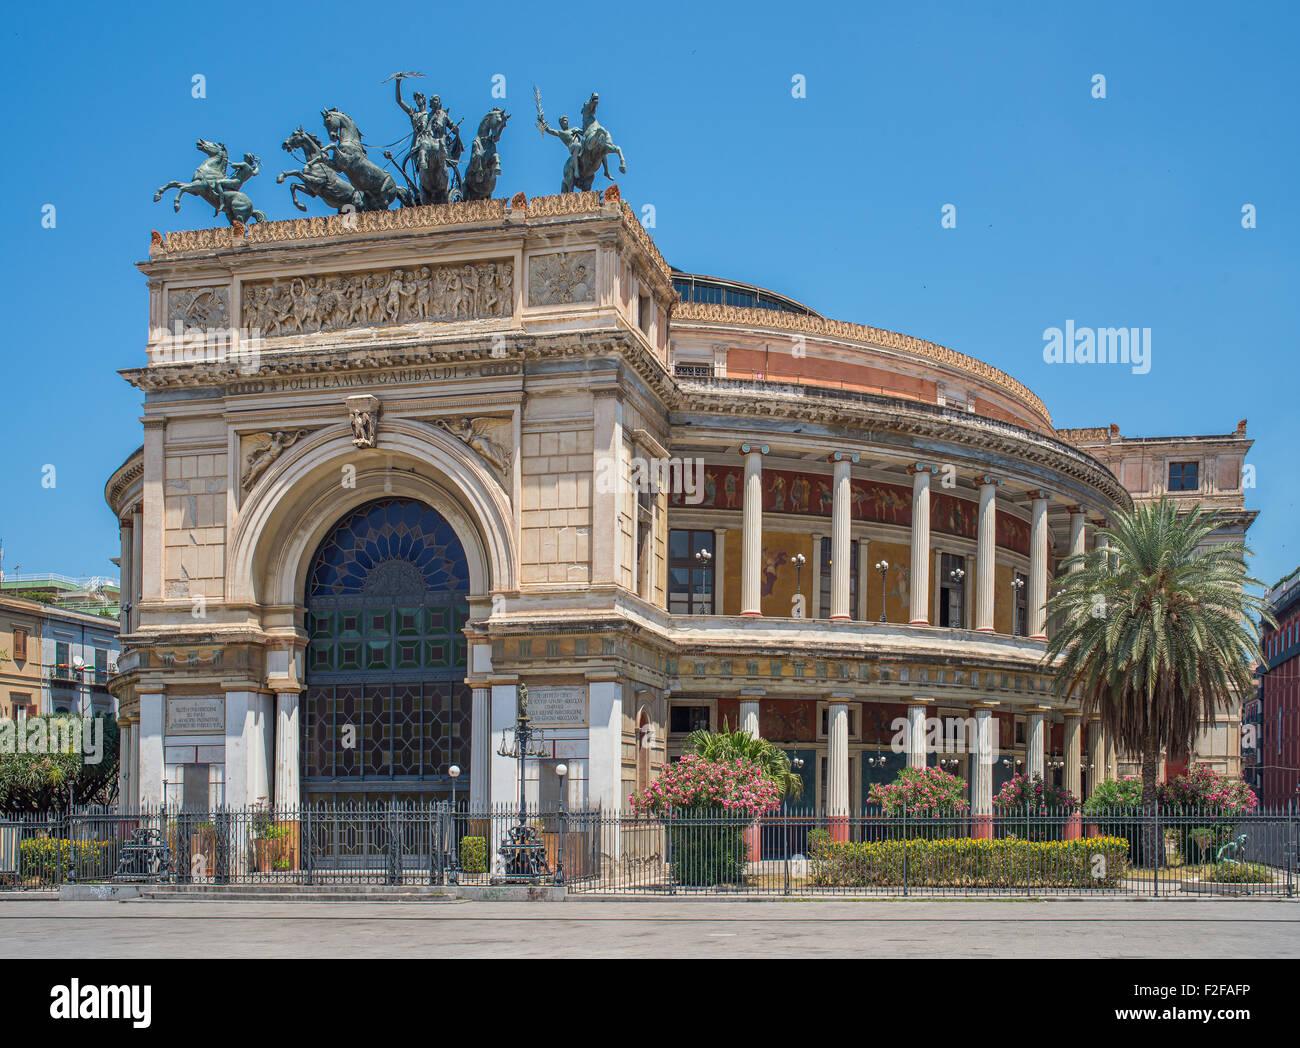 Politeama Garibaldi theater in Palermo, Sicily. Italy. Stock Photo